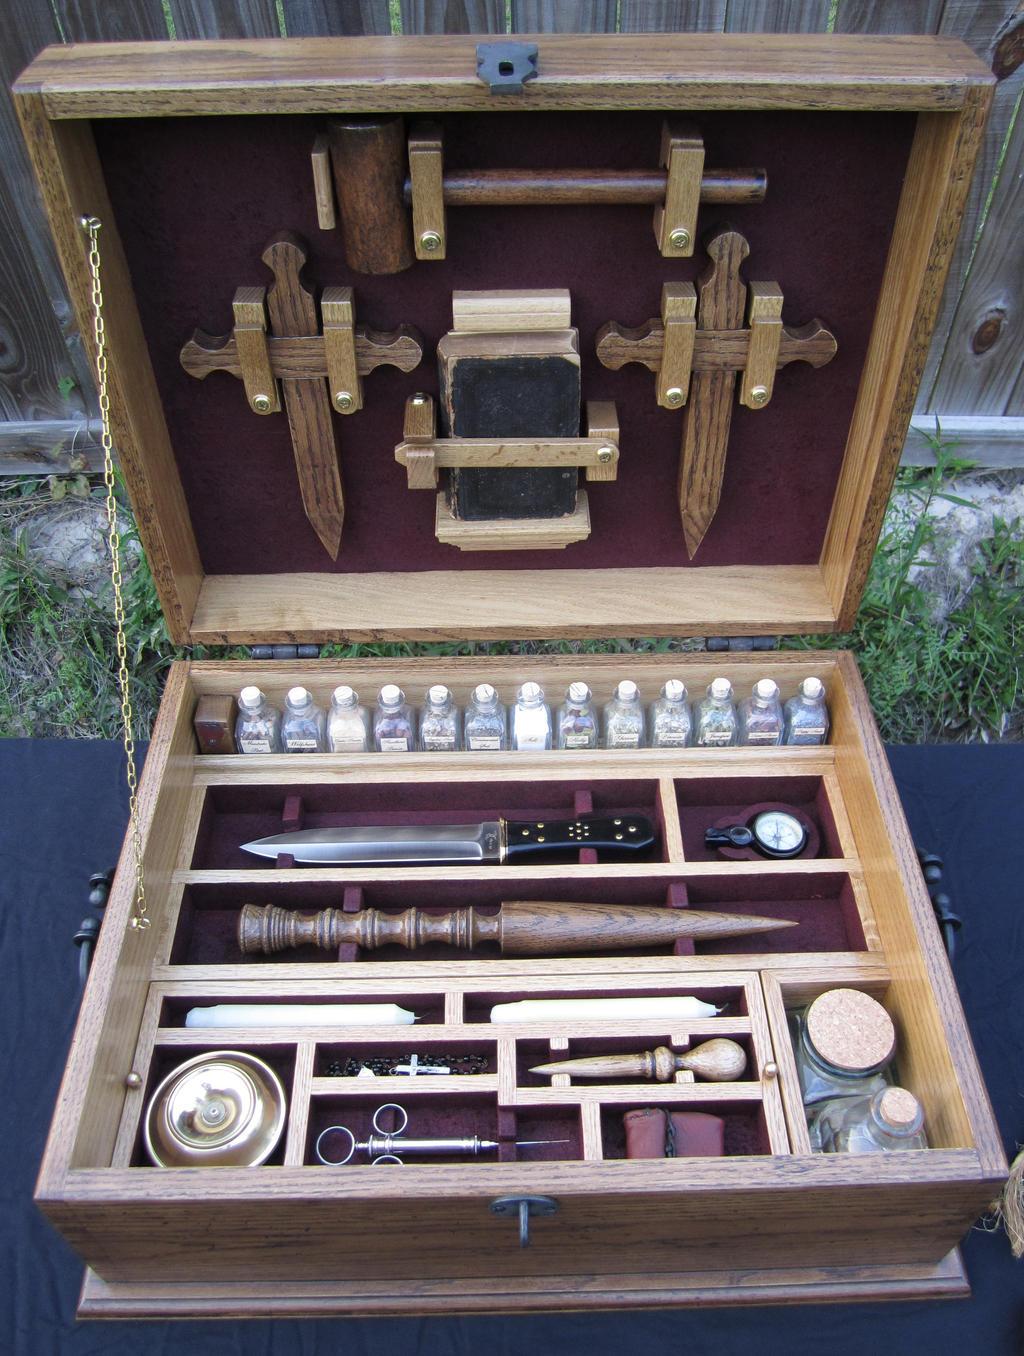 The Vampire Hunting Kit